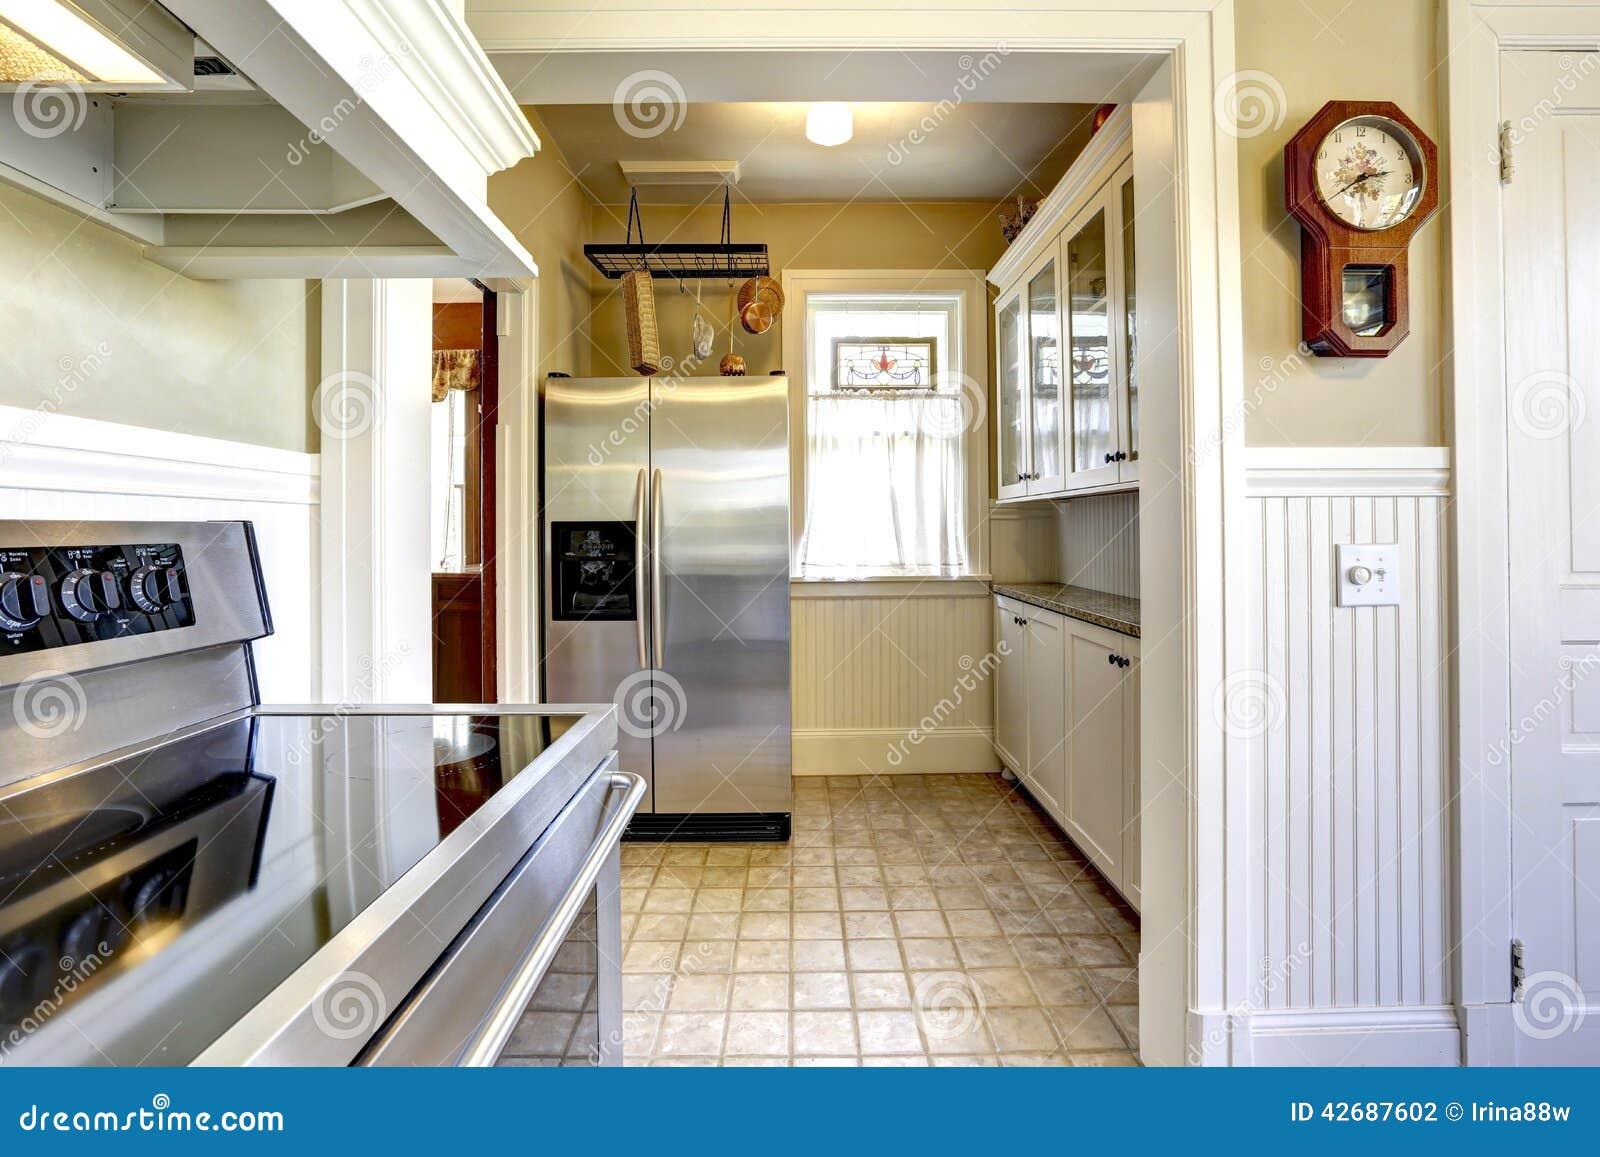 Keukenbinnenland in oud huis met moderne toestellen stock foto